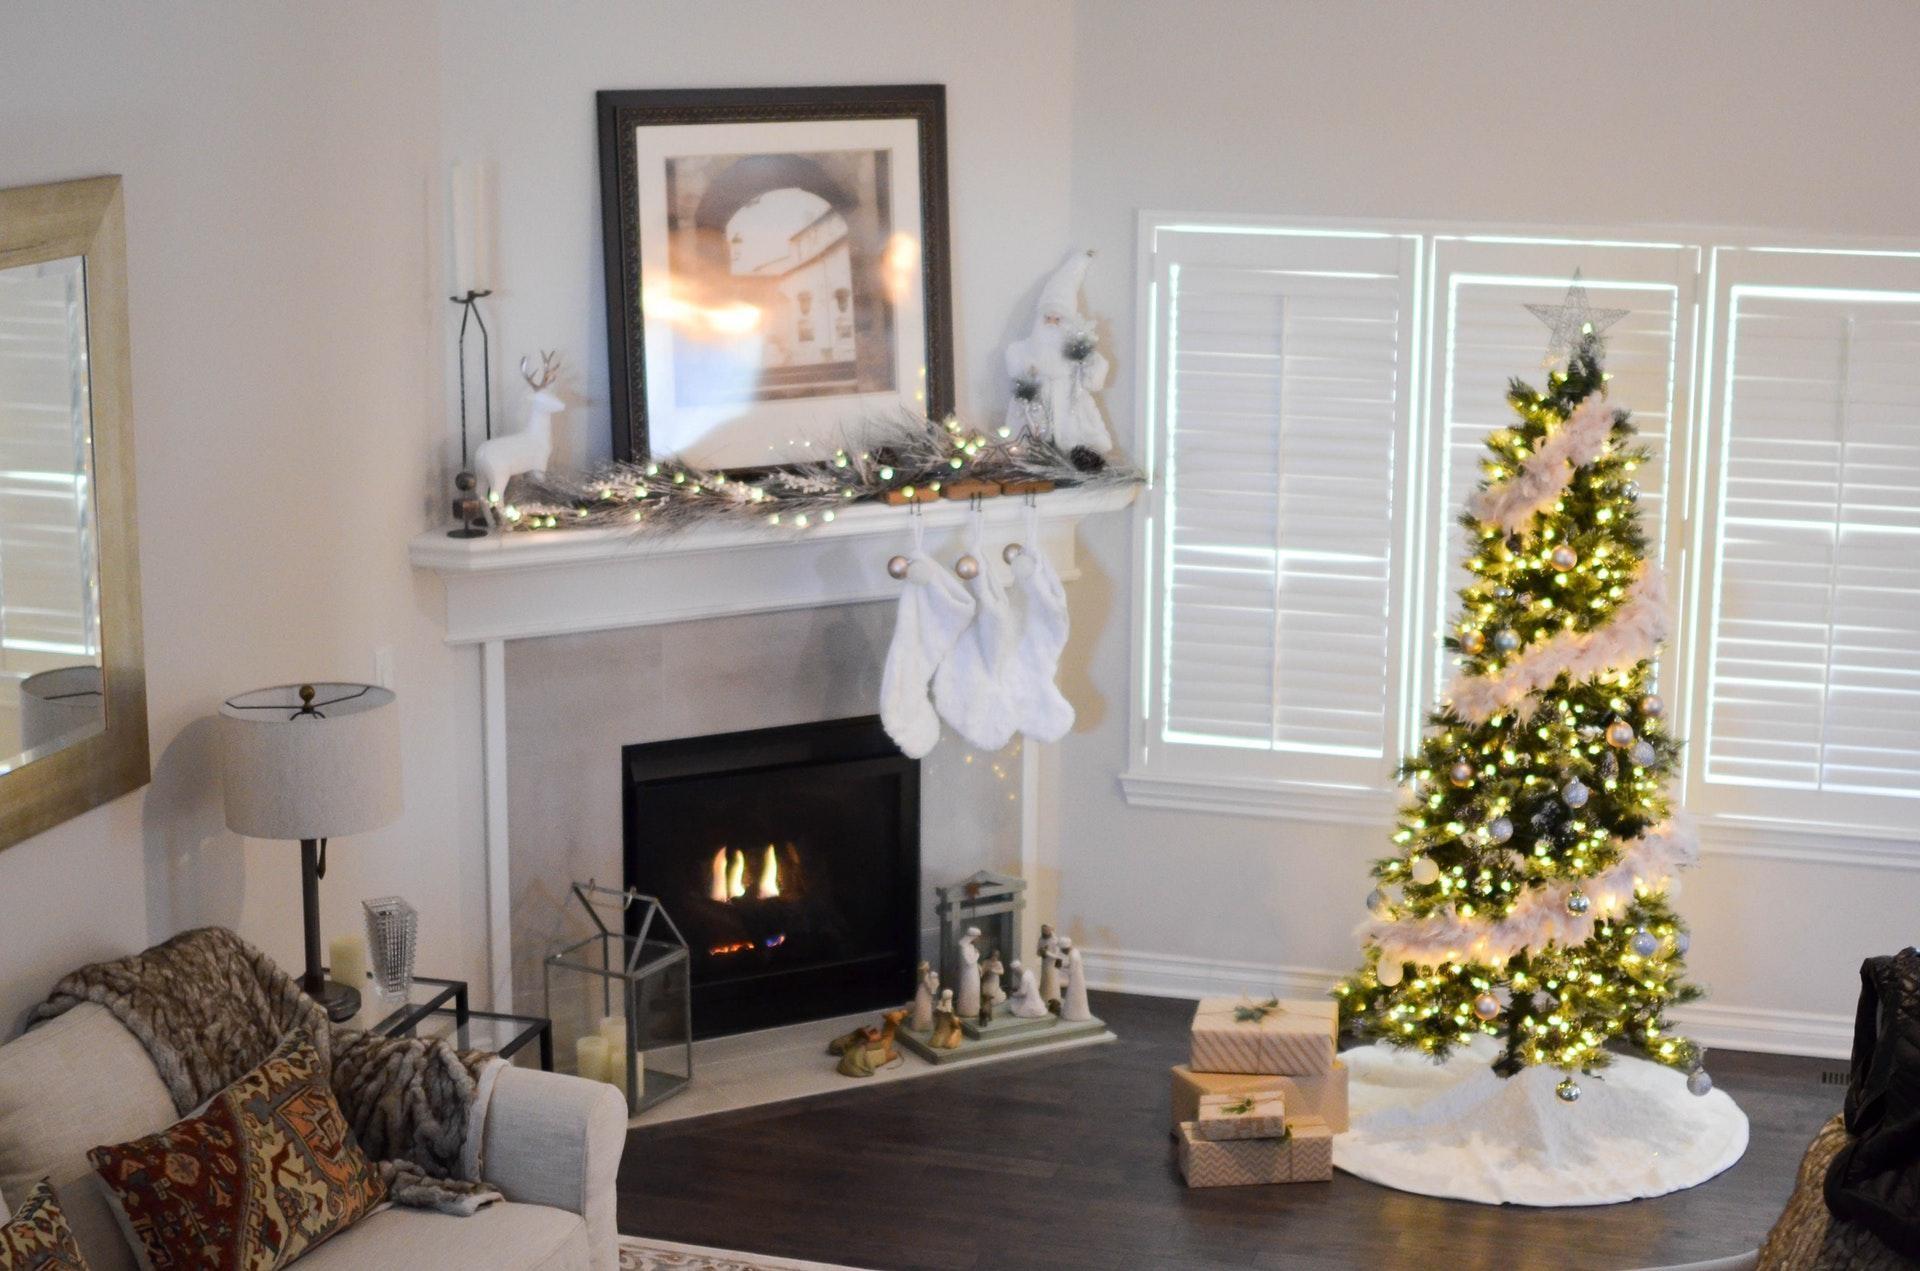 Idee Garage Fai Da Te decorazioni natalizie fai da te — idealista/news